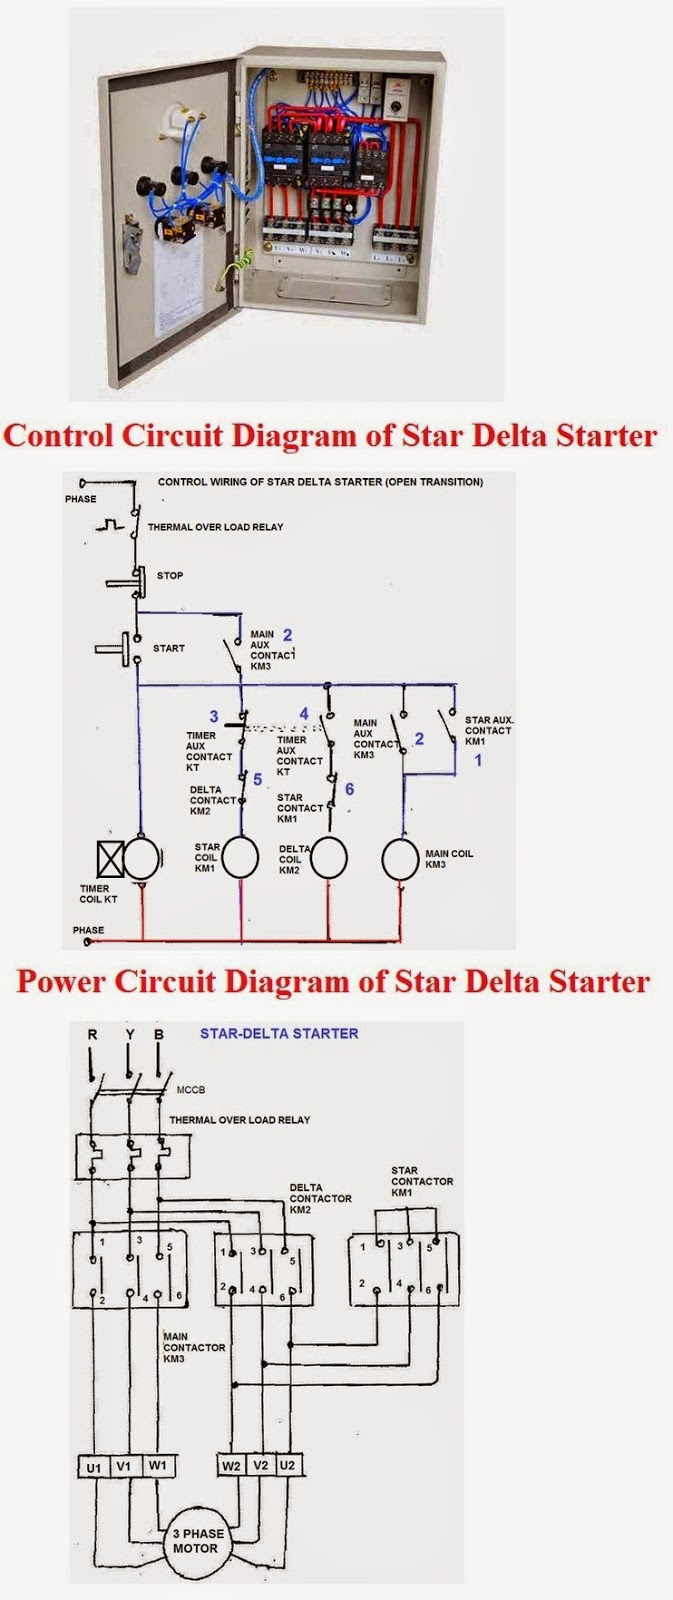 StarDelta Three Phase Motor Starter (Control & Power